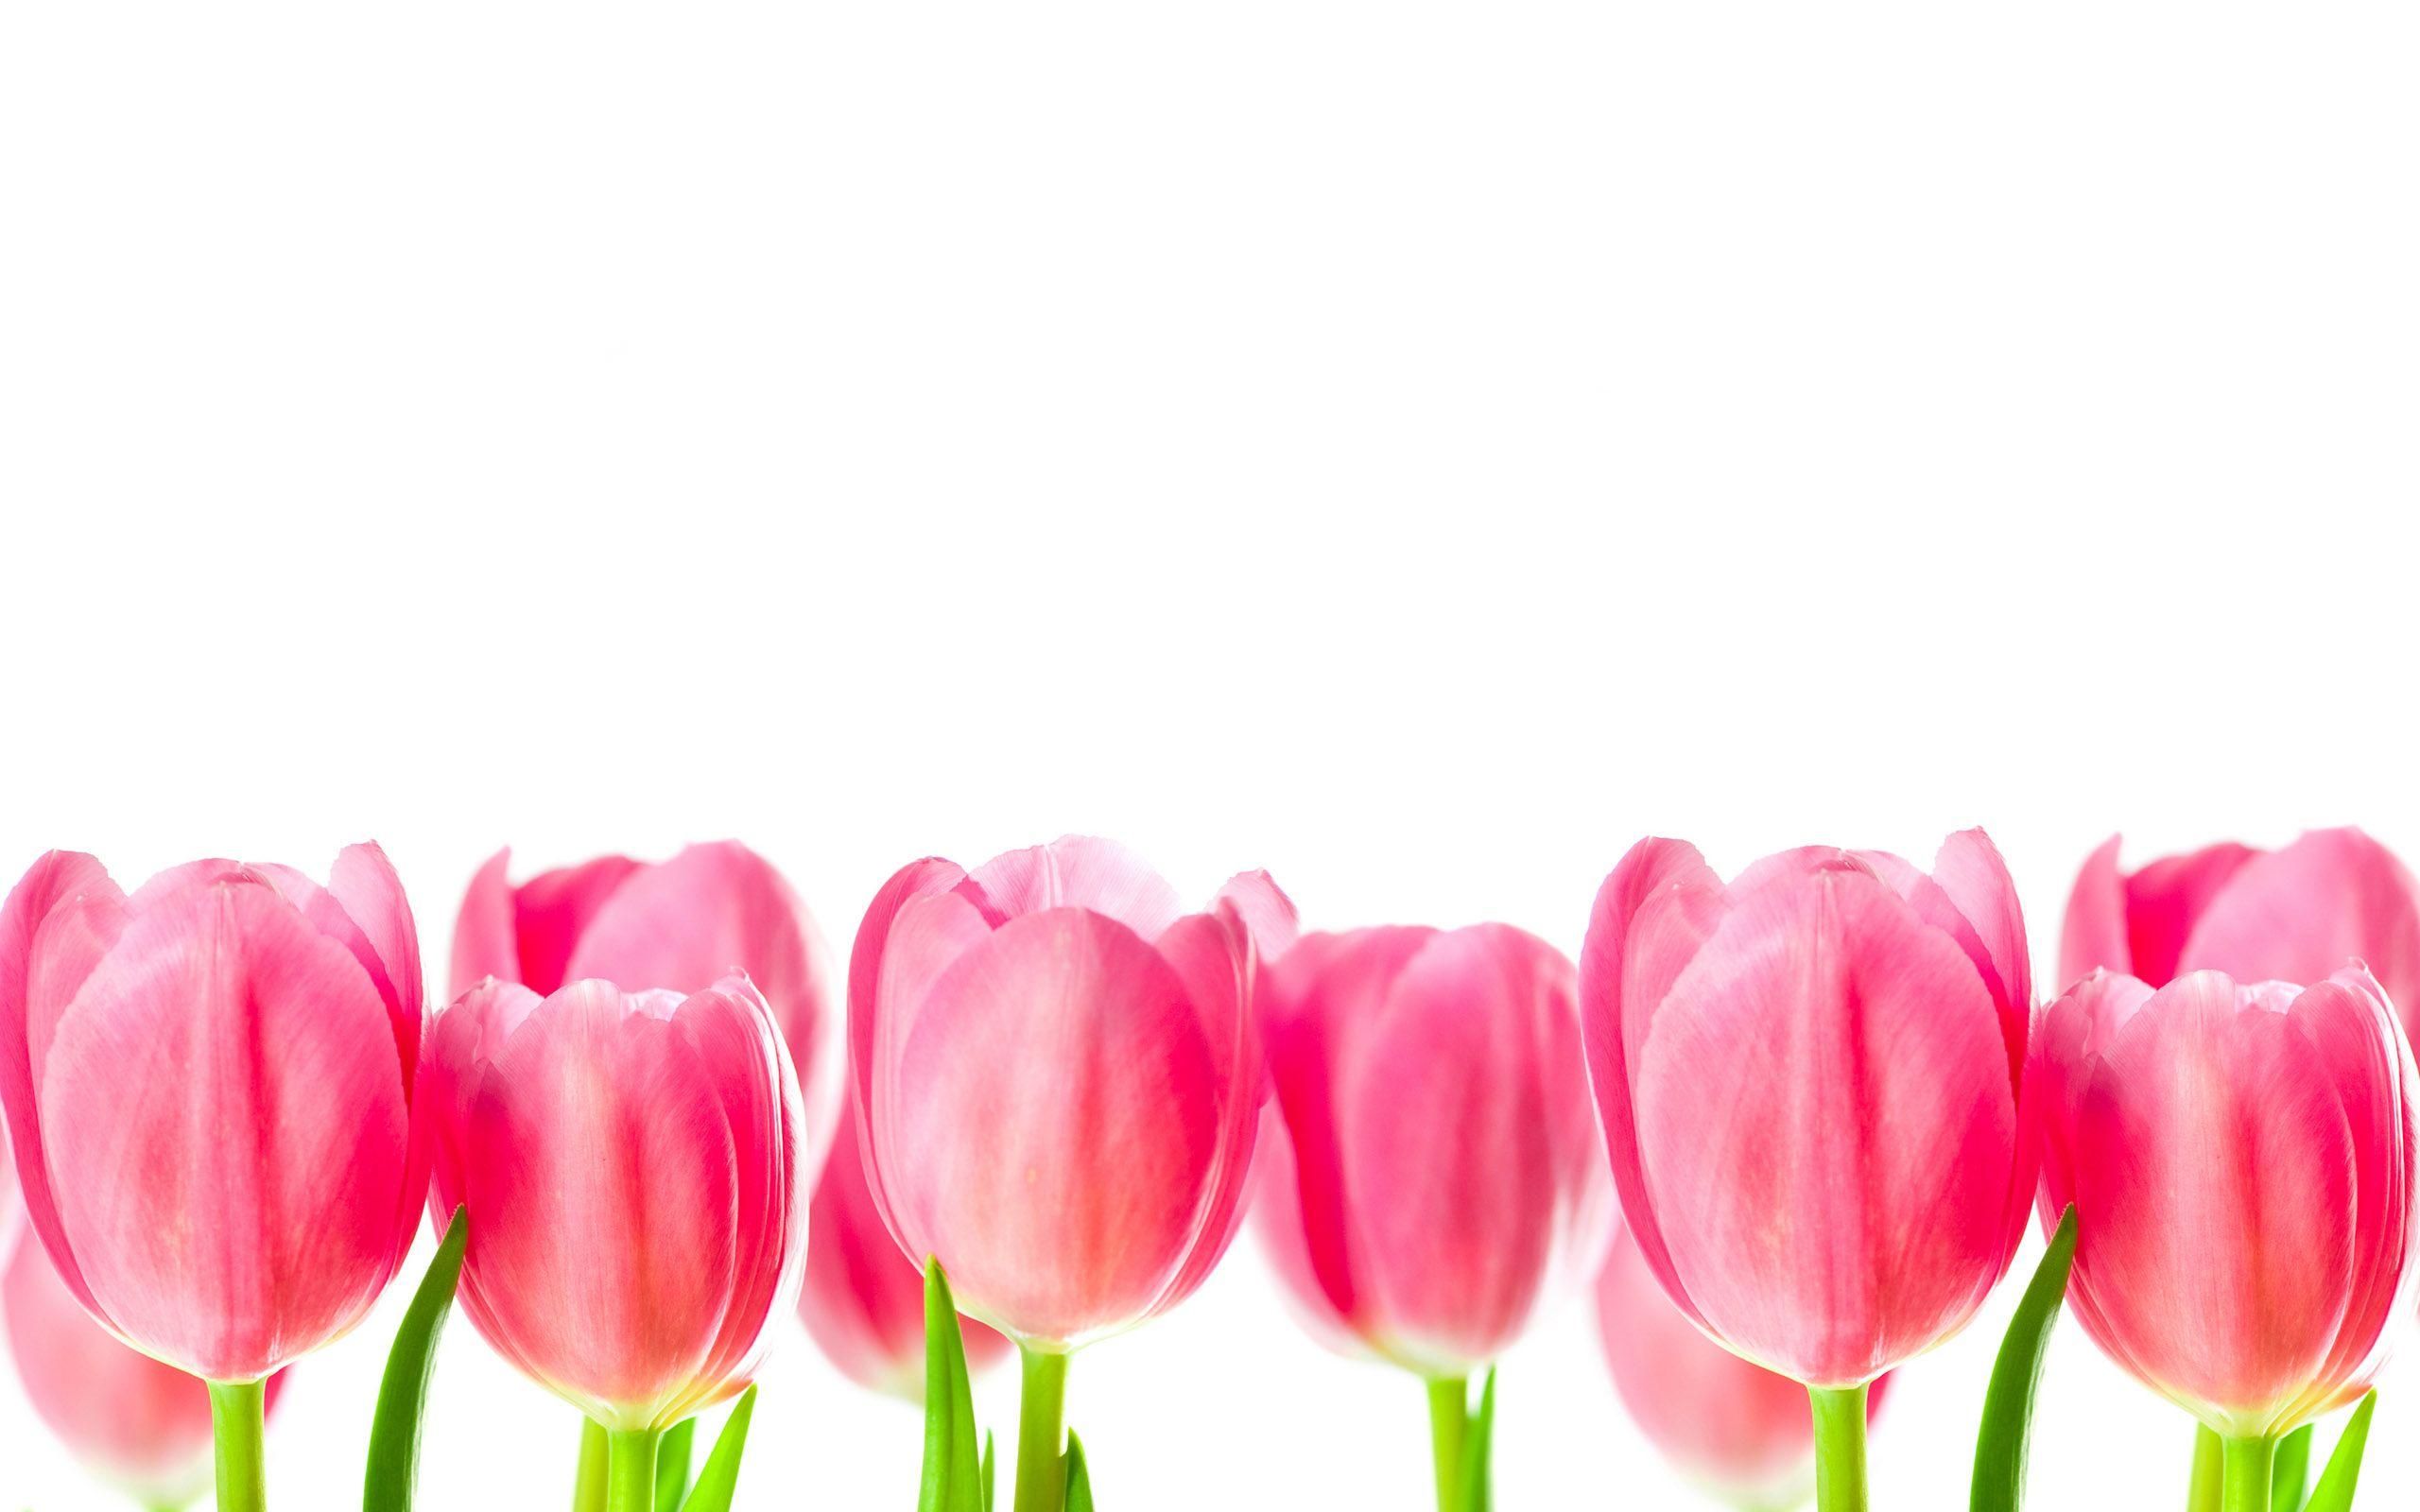 Wallpaper Wallpaper Tulp Animaatjes 0 Tulpen Mac Achtergrond Roze Tulpen